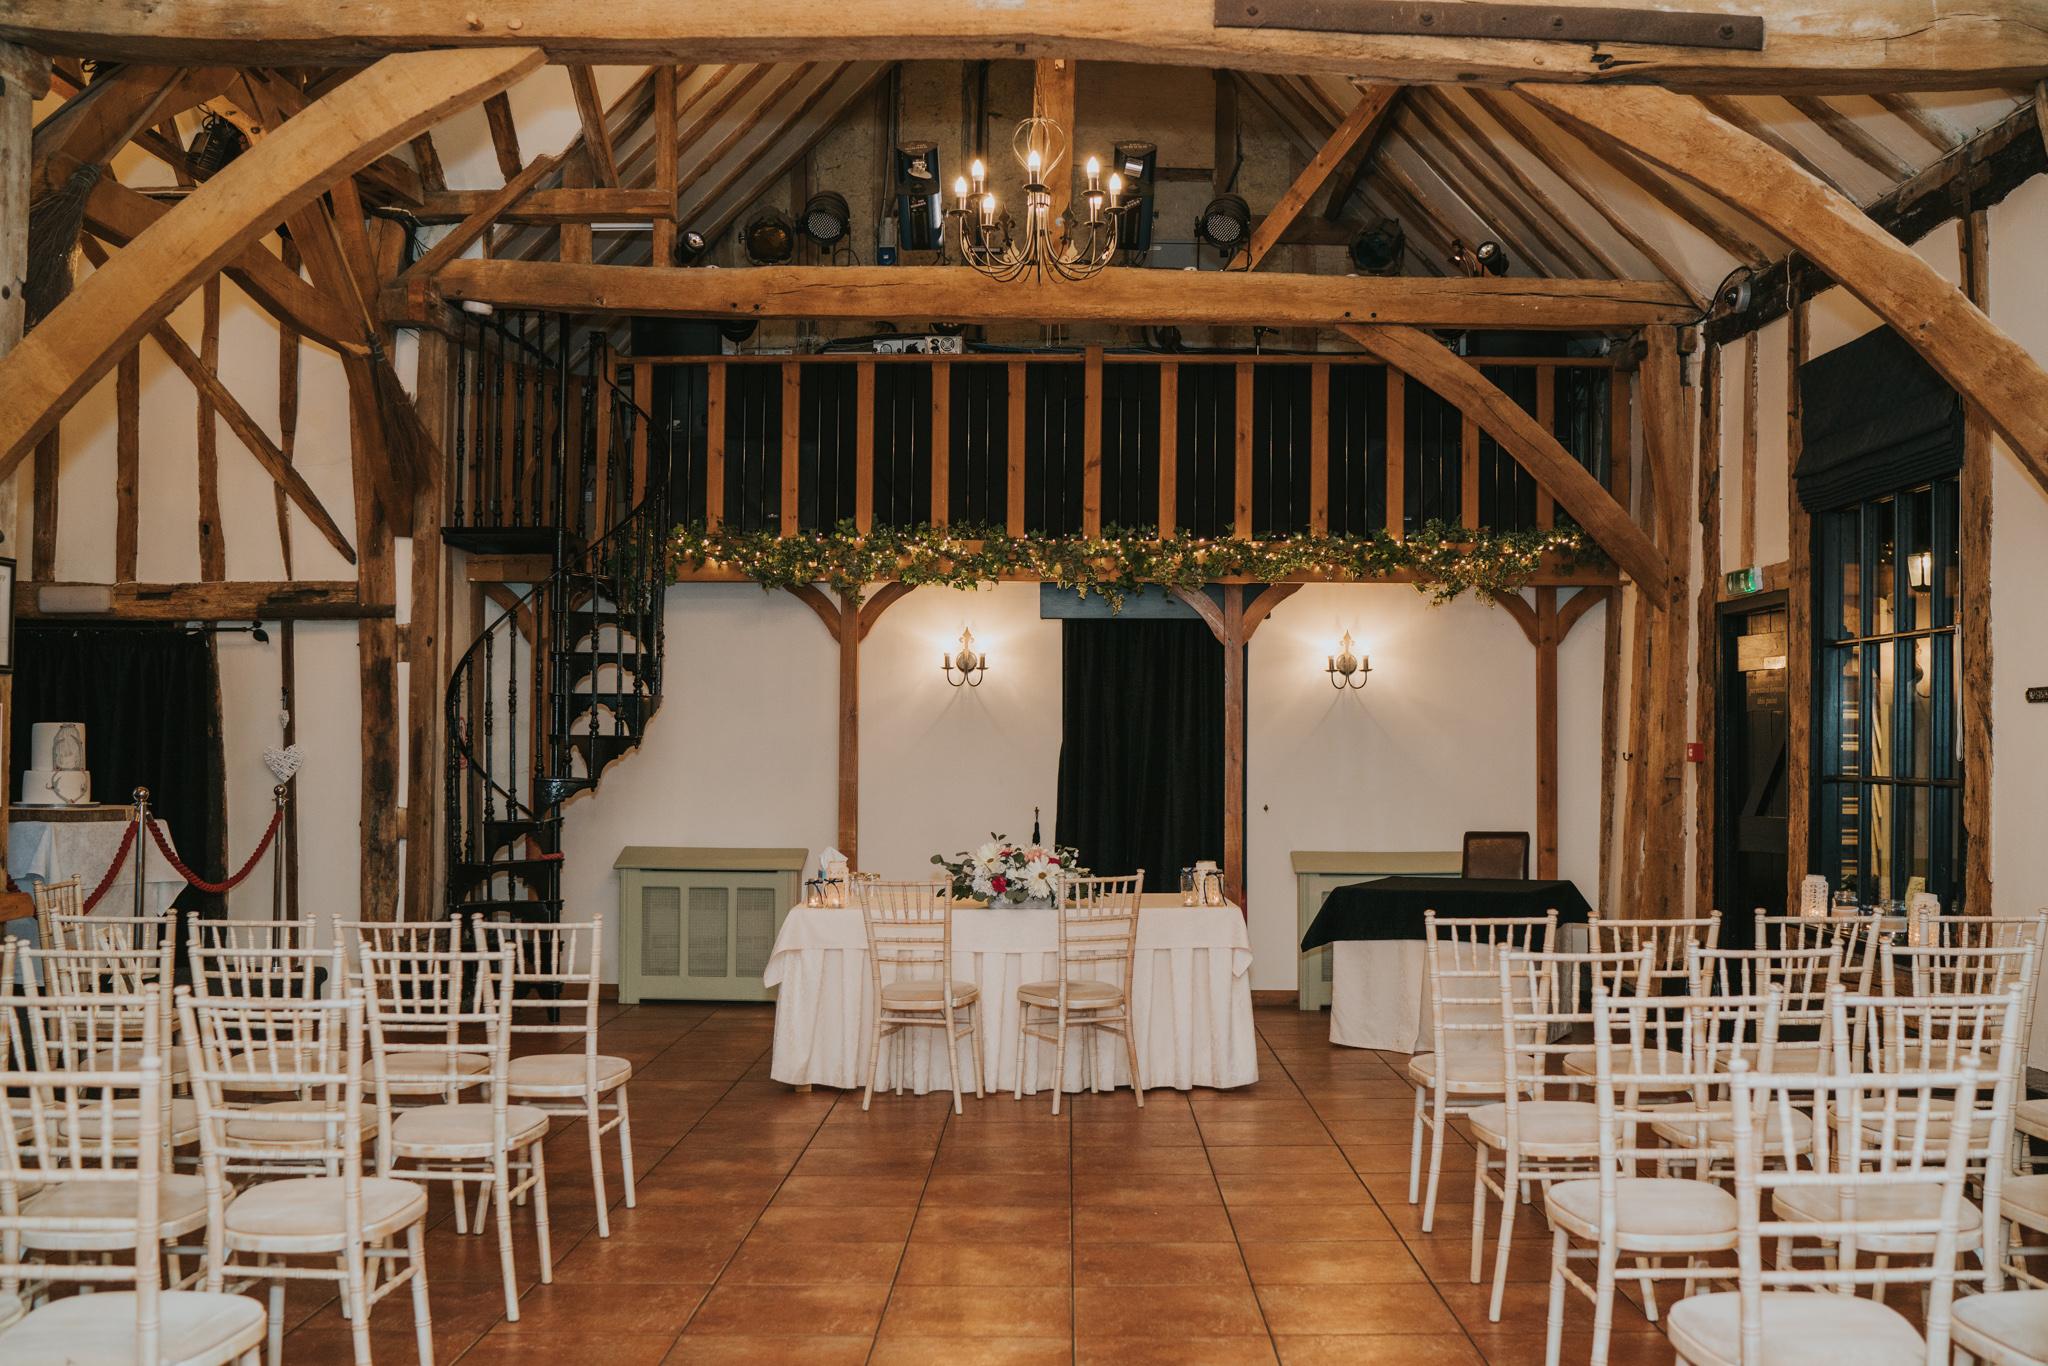 rhia-james-rustic-crabbs-barn-vintage-50s-retro-wedding-grace-elizabeth-colchester-essex-alternative-relaxed-wedding-family-photography-devon-suffolk-norfolk-essex (56 of 138).jpg